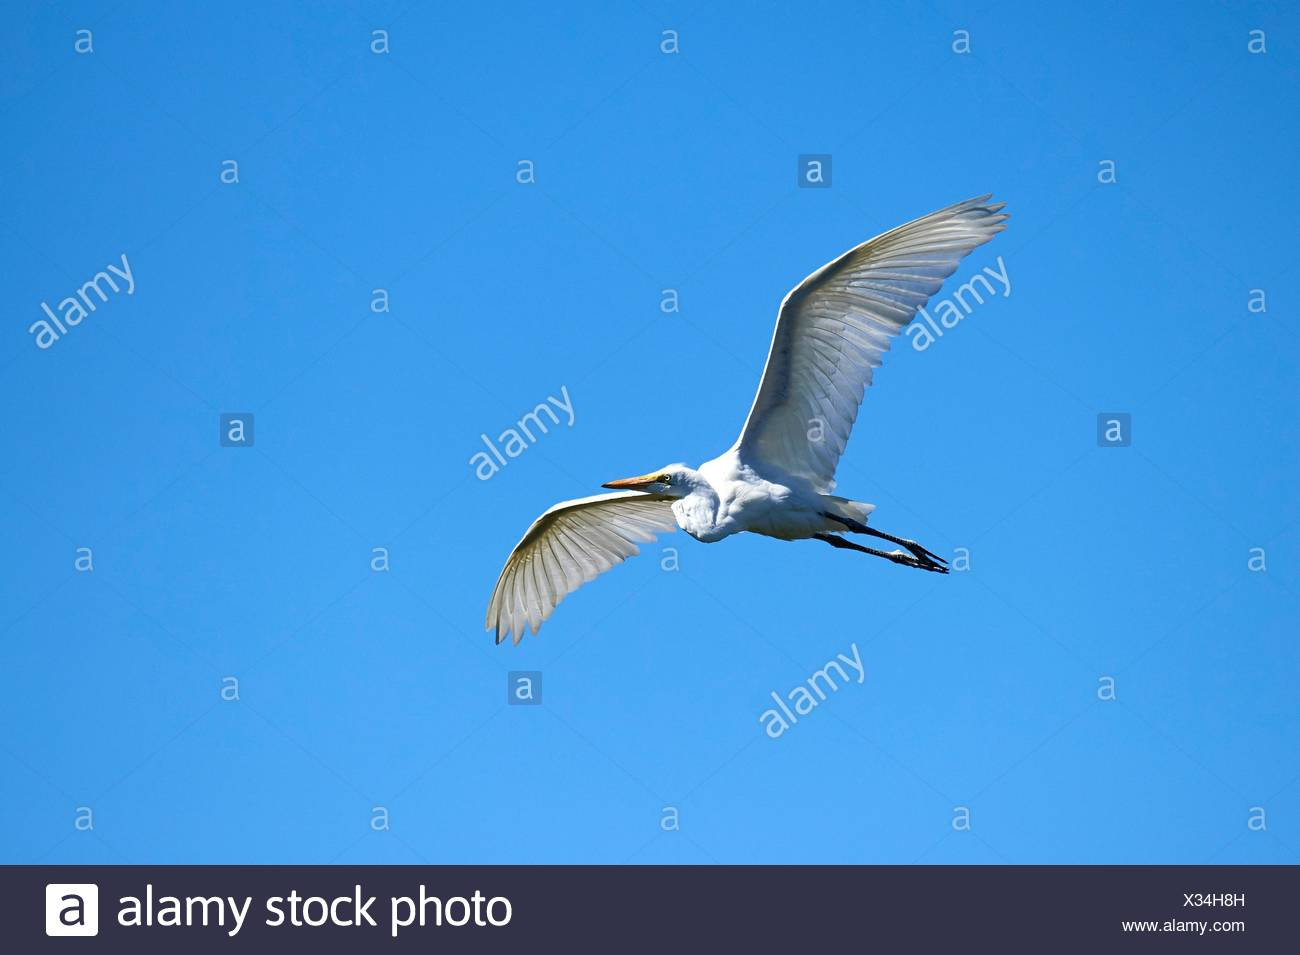 Great Egret flying (Ardea alba), Moremi National Park, Okavango Delta, Botswana, Southern Africa. - Stock Image